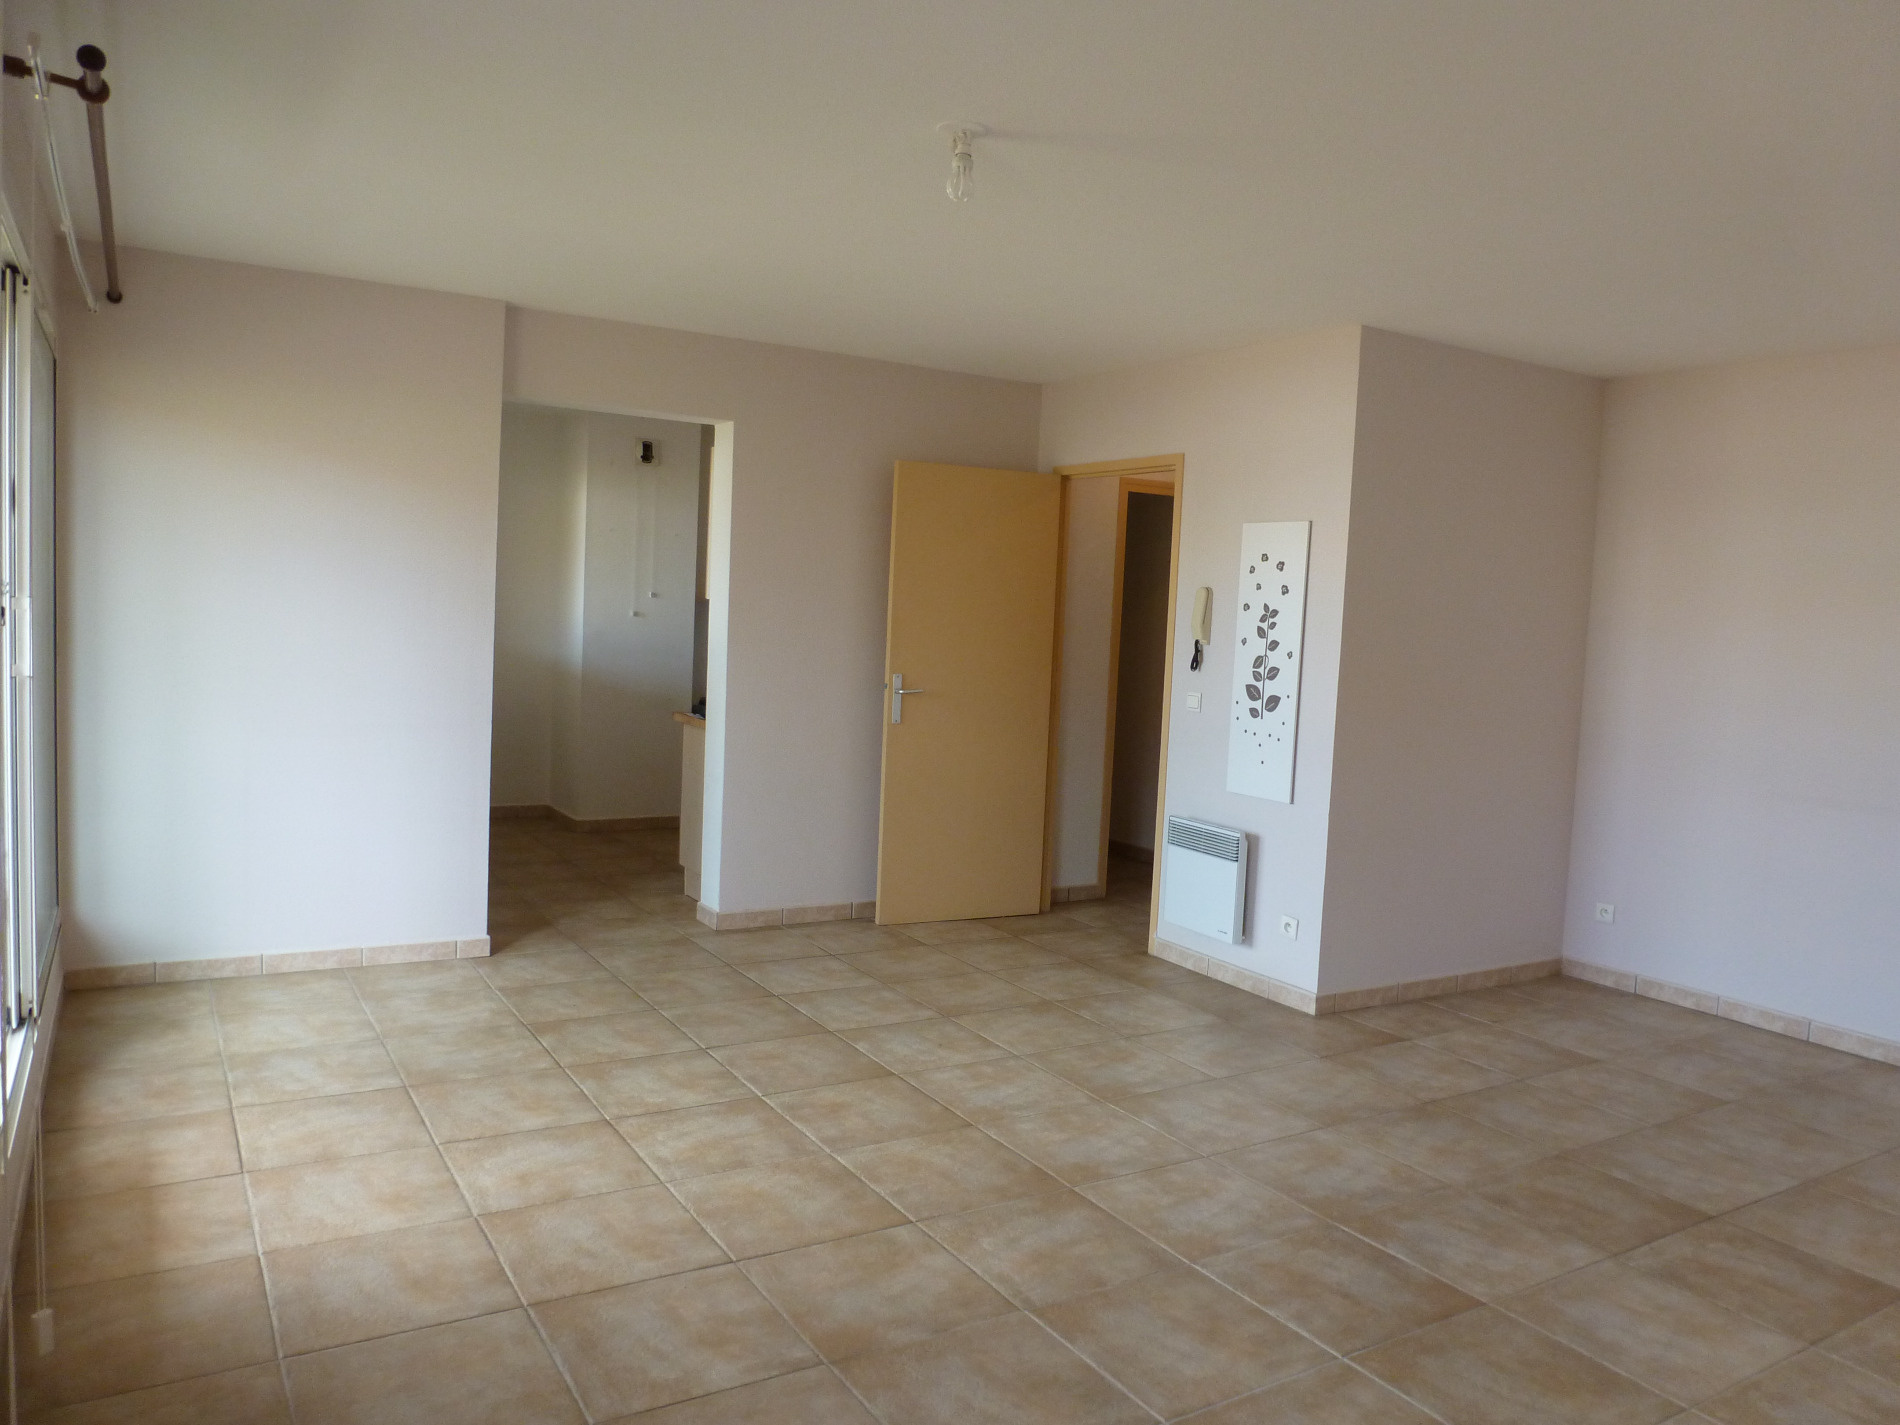 Location location a perpignan sud saint gaud rique appartement t4 84m sh garage 802 - Location garage perpignan ...